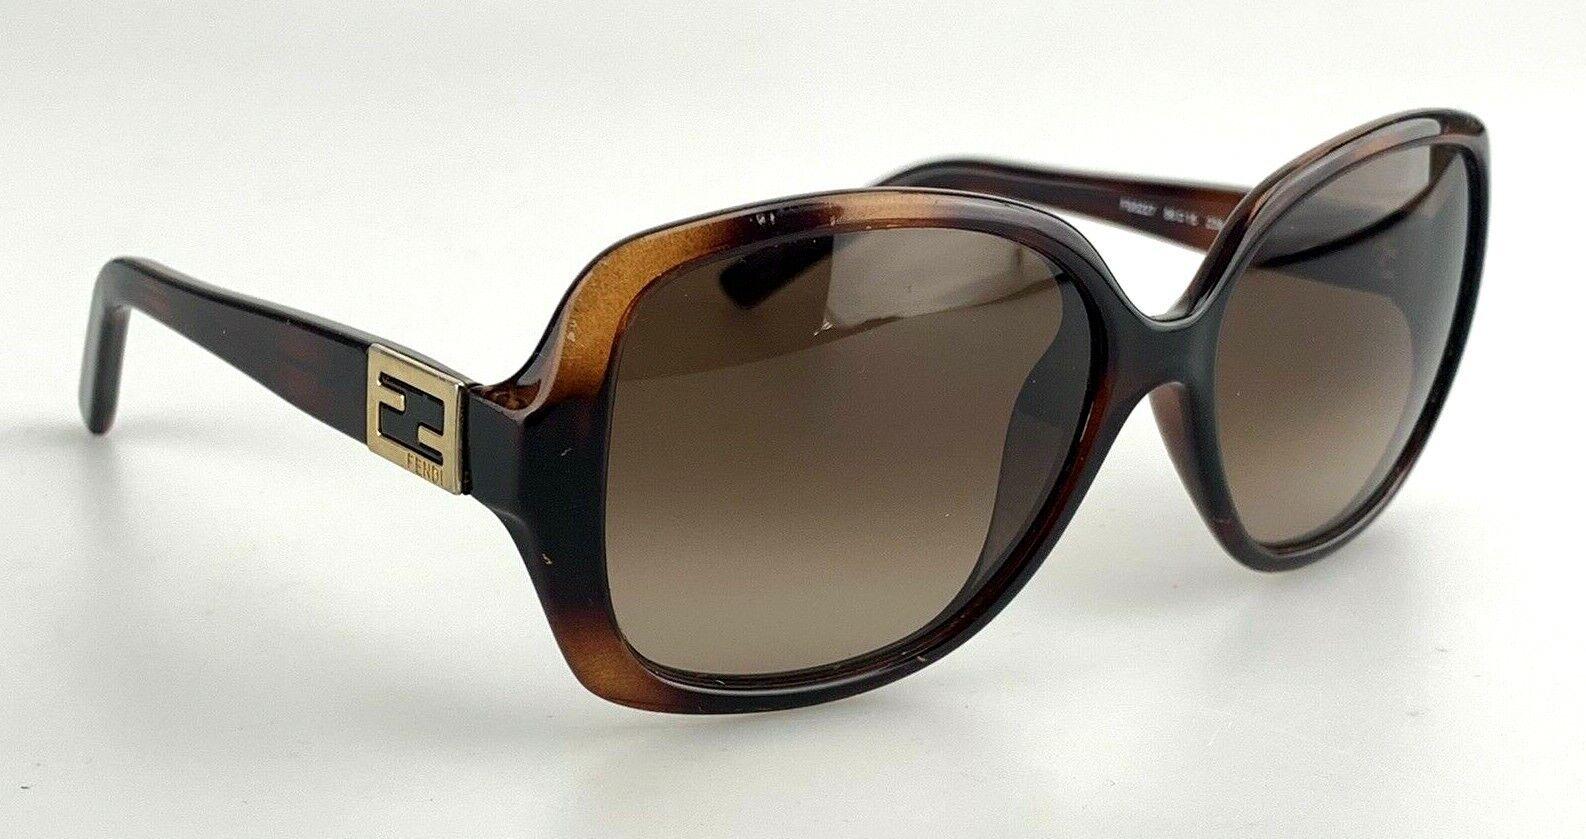 FENDI Sunglasses mod. FS5227 238 Brown Oversized Tortoise Made in Italy